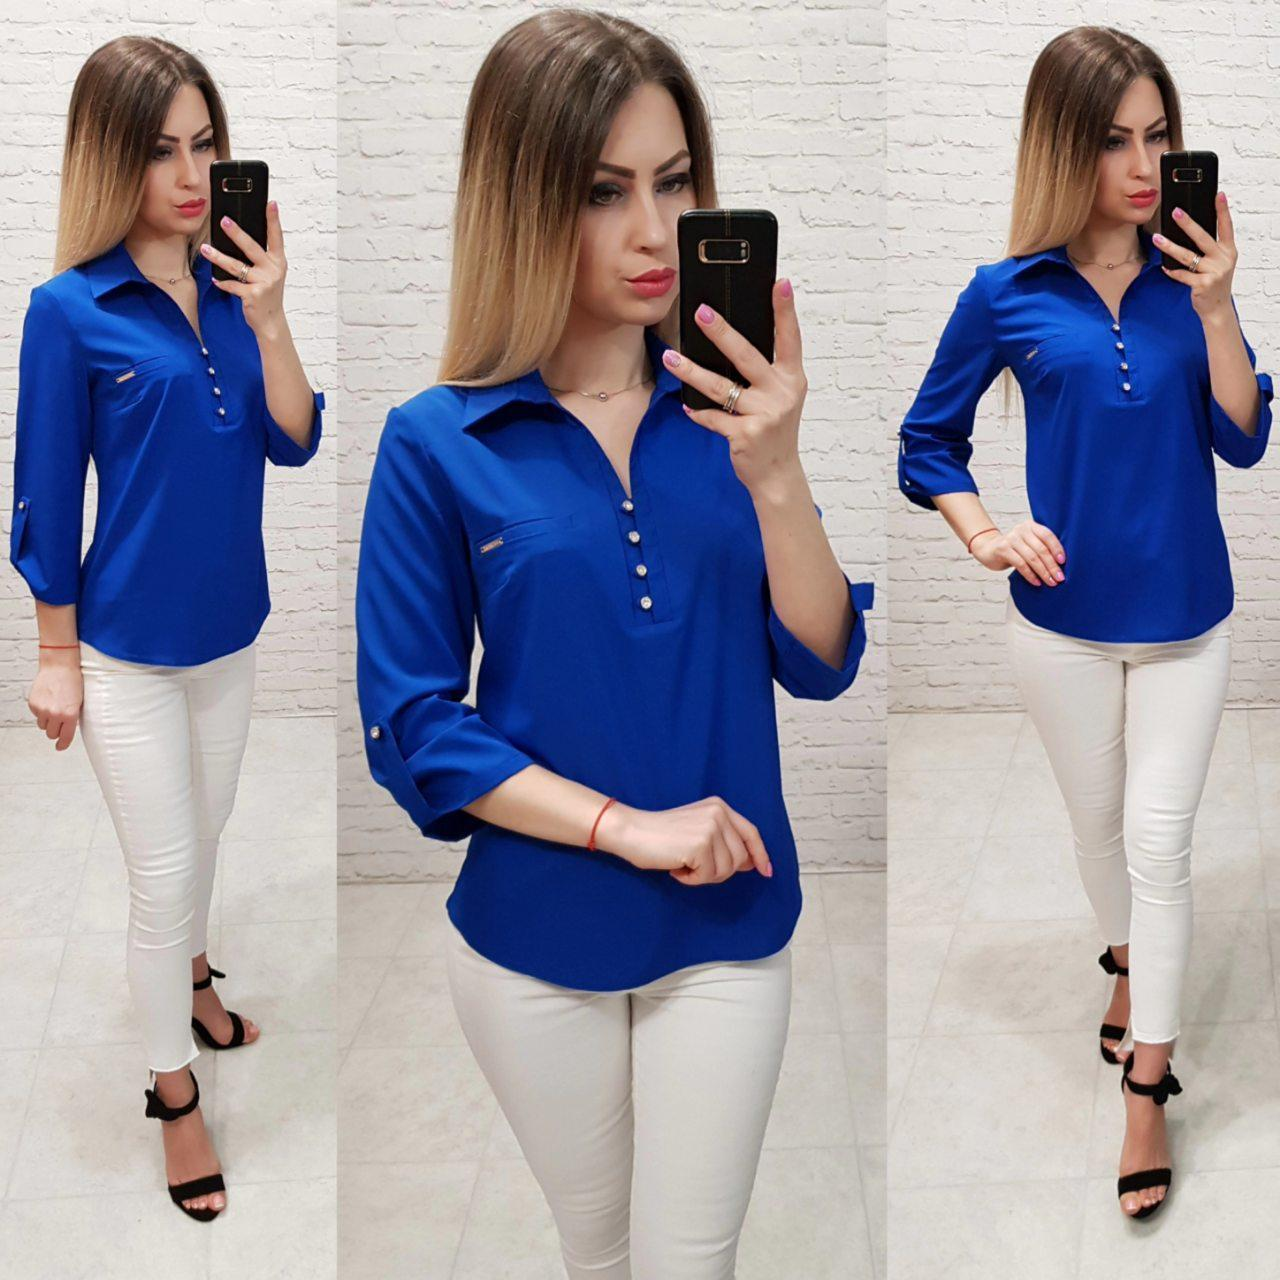 Блузка/блуза - рубашка с пуговками на груди, модель 828 , цвет электрик